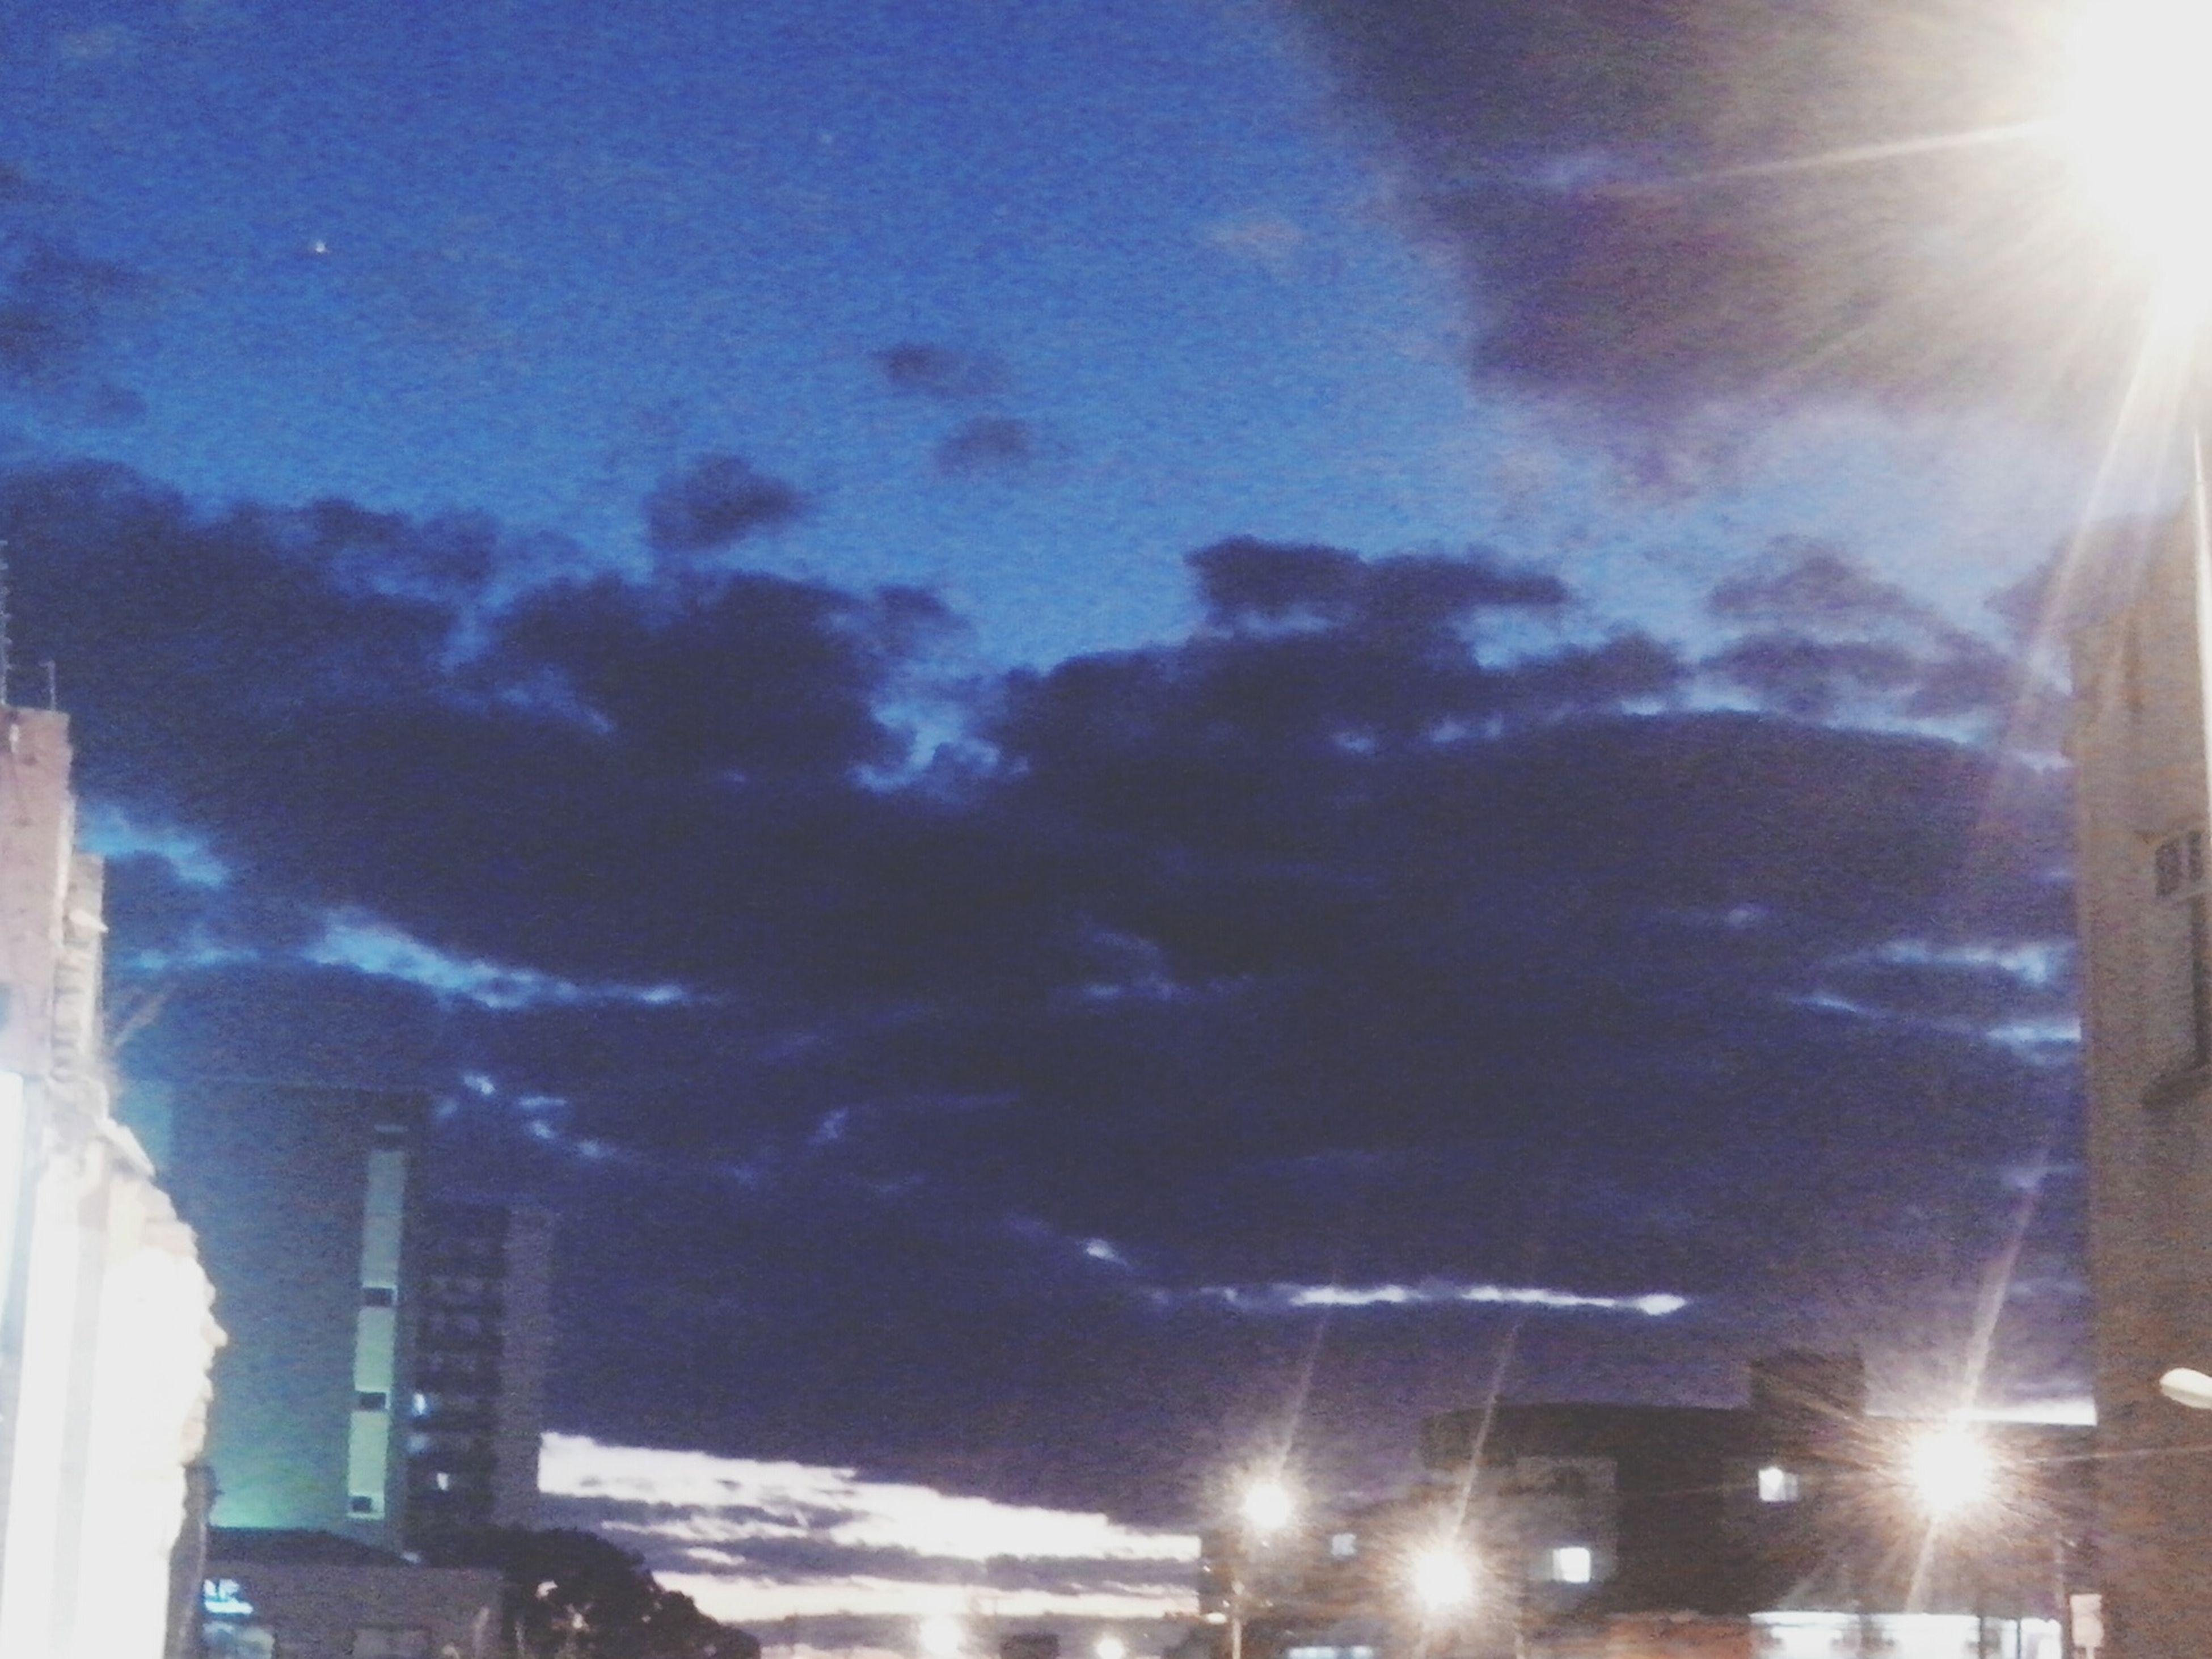 low angle view, sky, built structure, sunbeam, lens flare, building exterior, sun, architecture, street light, sunlight, illuminated, city, night, cloud - sky, car, silhouette, outdoors, building, transportation, no people